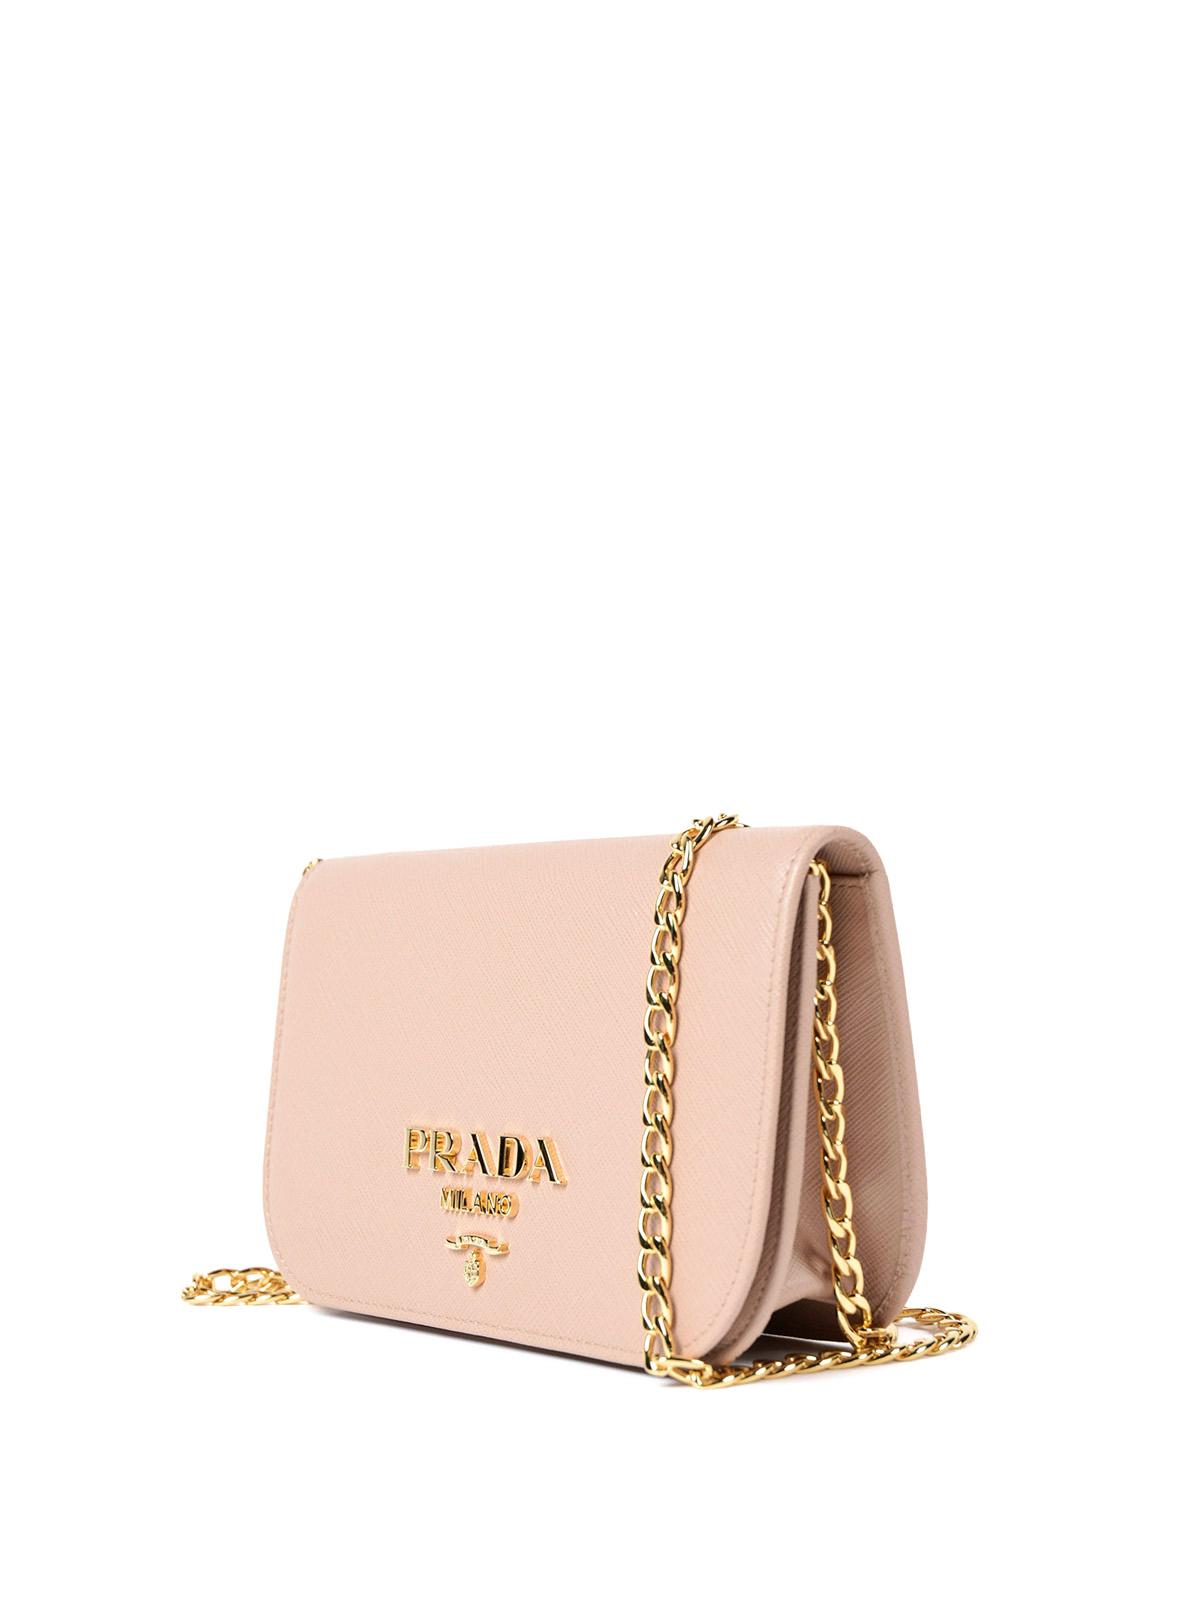 1445a33c02 Prada - Saffiano leather small pink bag - shoulder bags - 1BH019NZVVTR